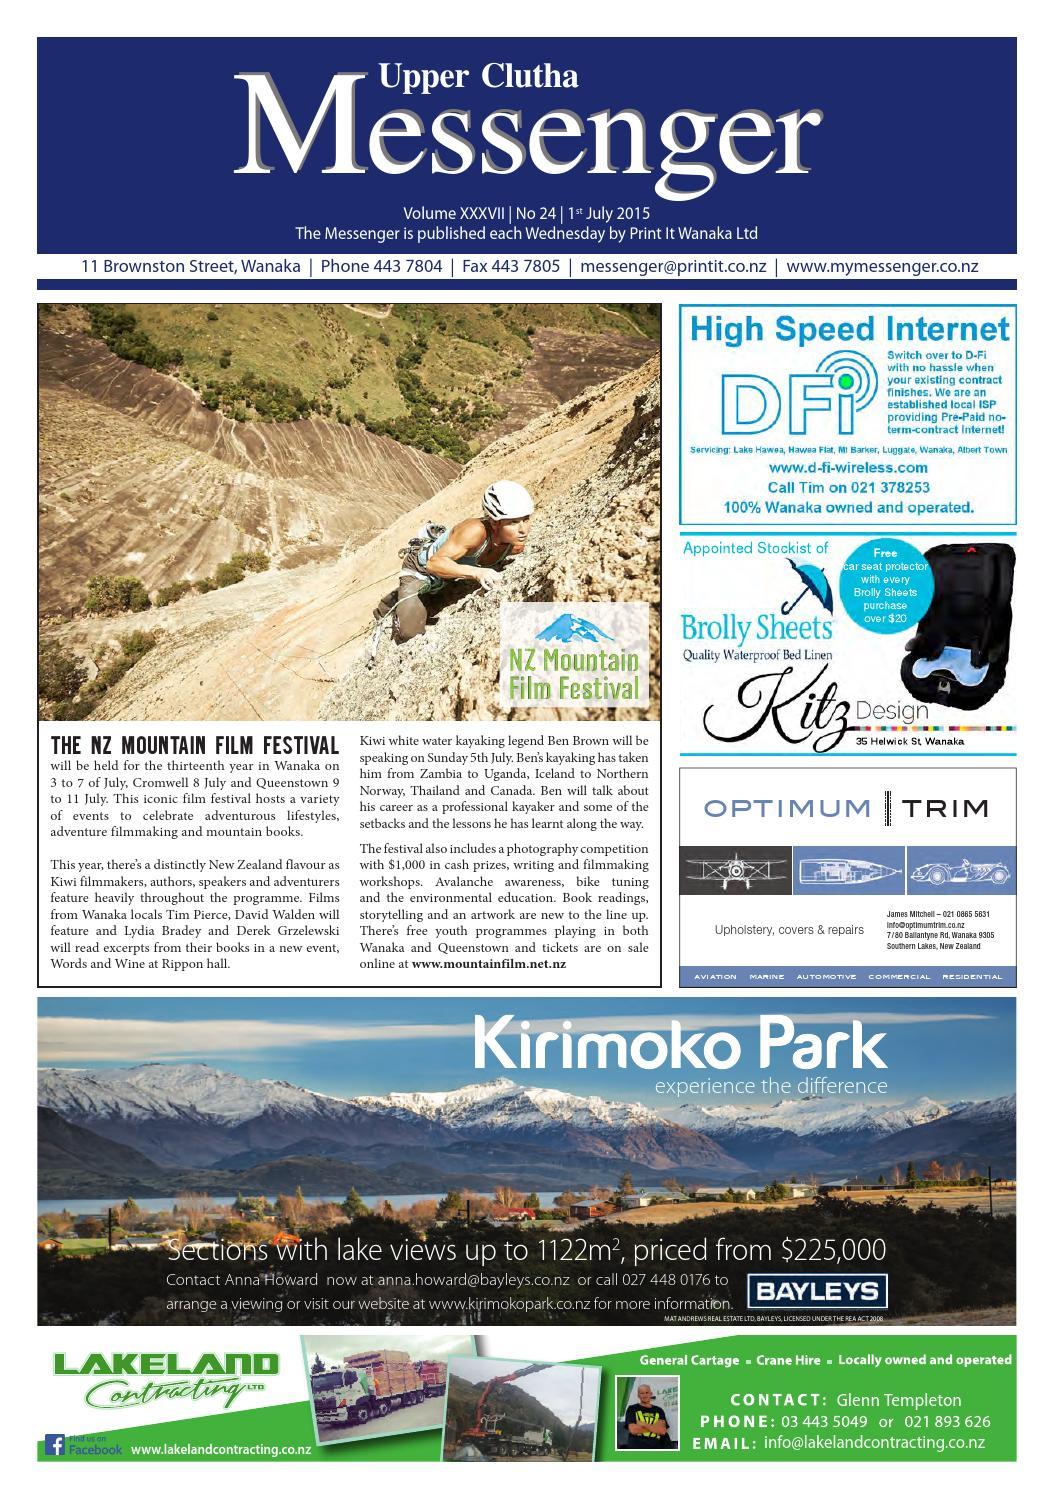 upper clutha messenger 1st july 2015 by print it wanaka ltd issuu